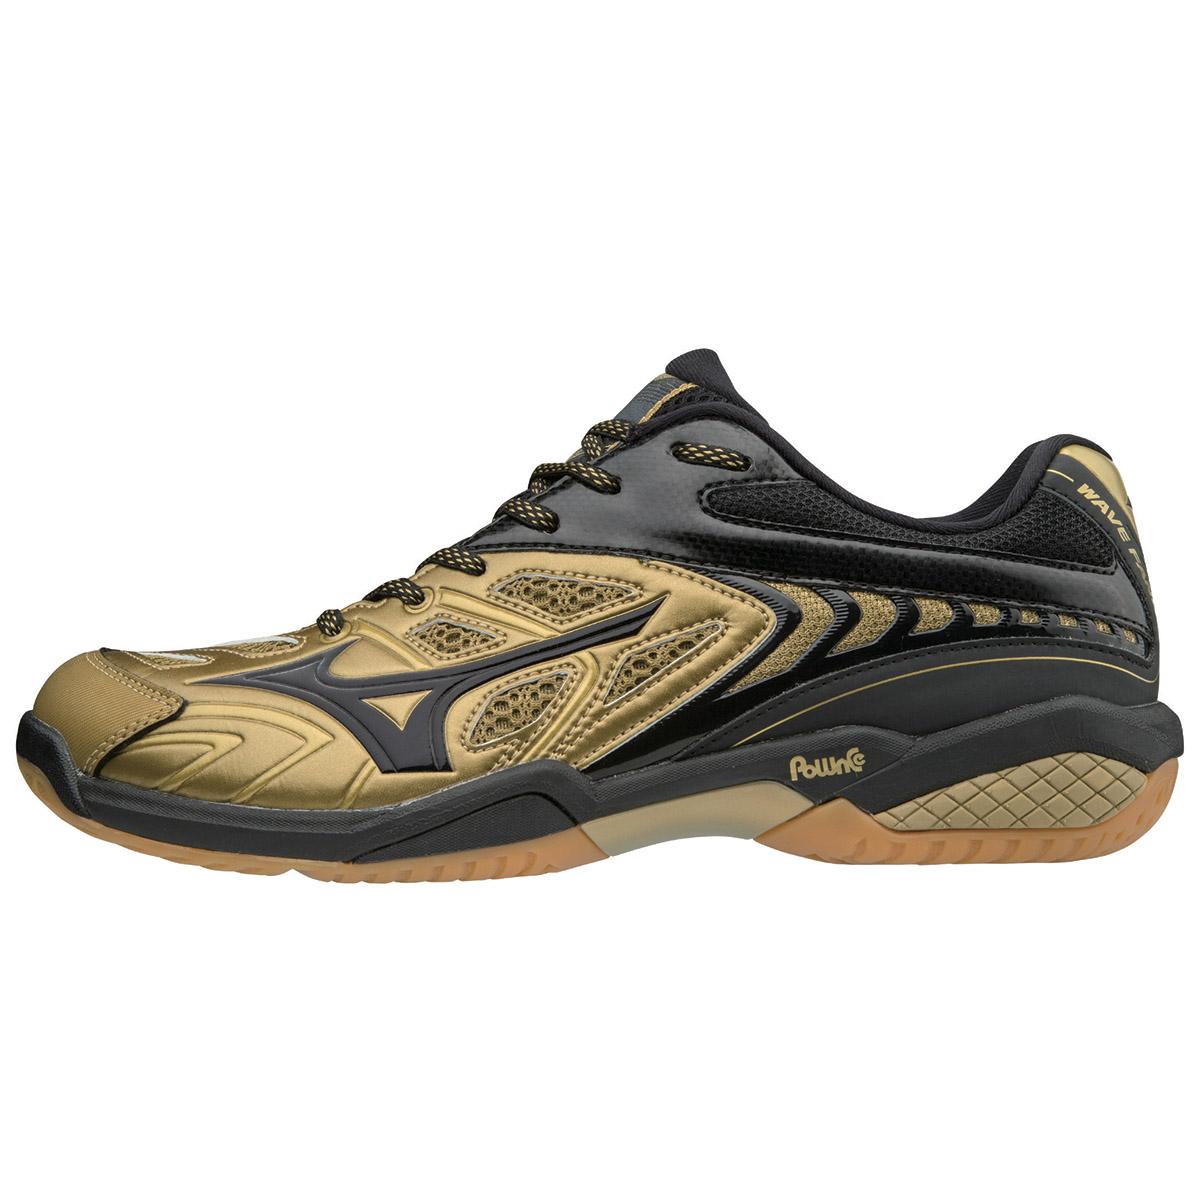 534ae80c8b95 mizuno badminton shoes singapore | Many promotions